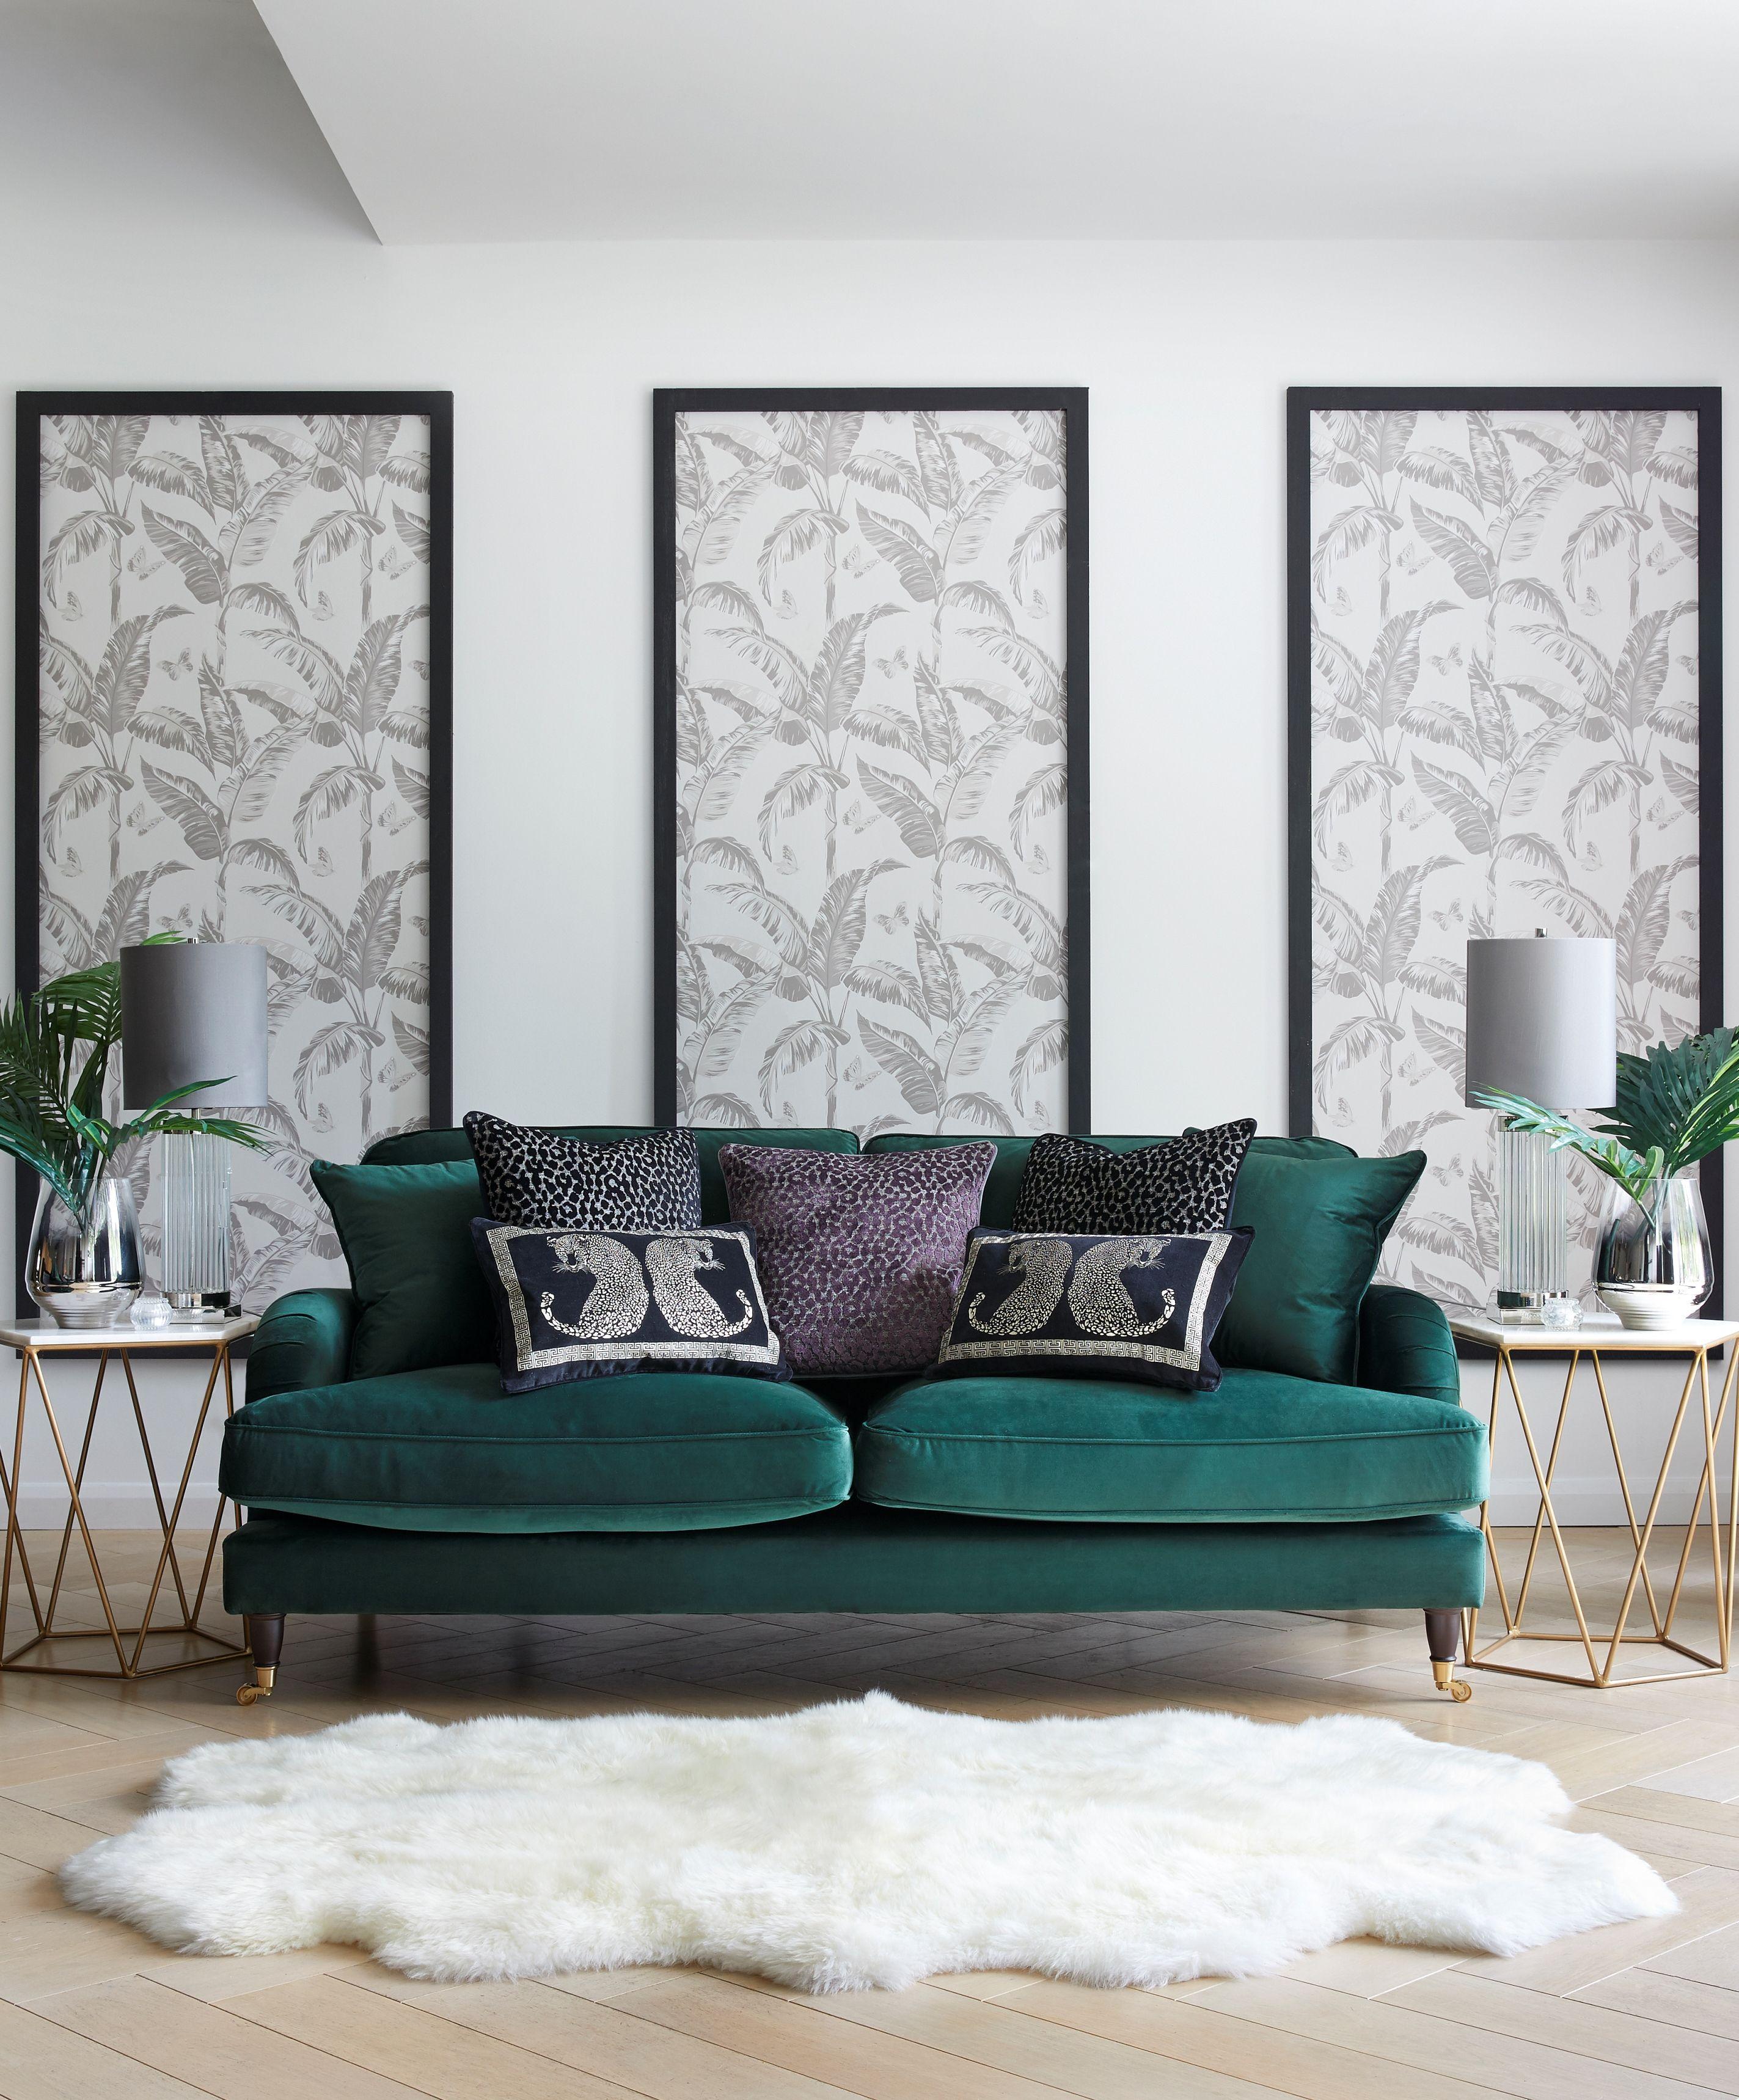 Looking for an on trend sofa in 2021   Velvet sofa living room, Green sofa living room, Teal ...